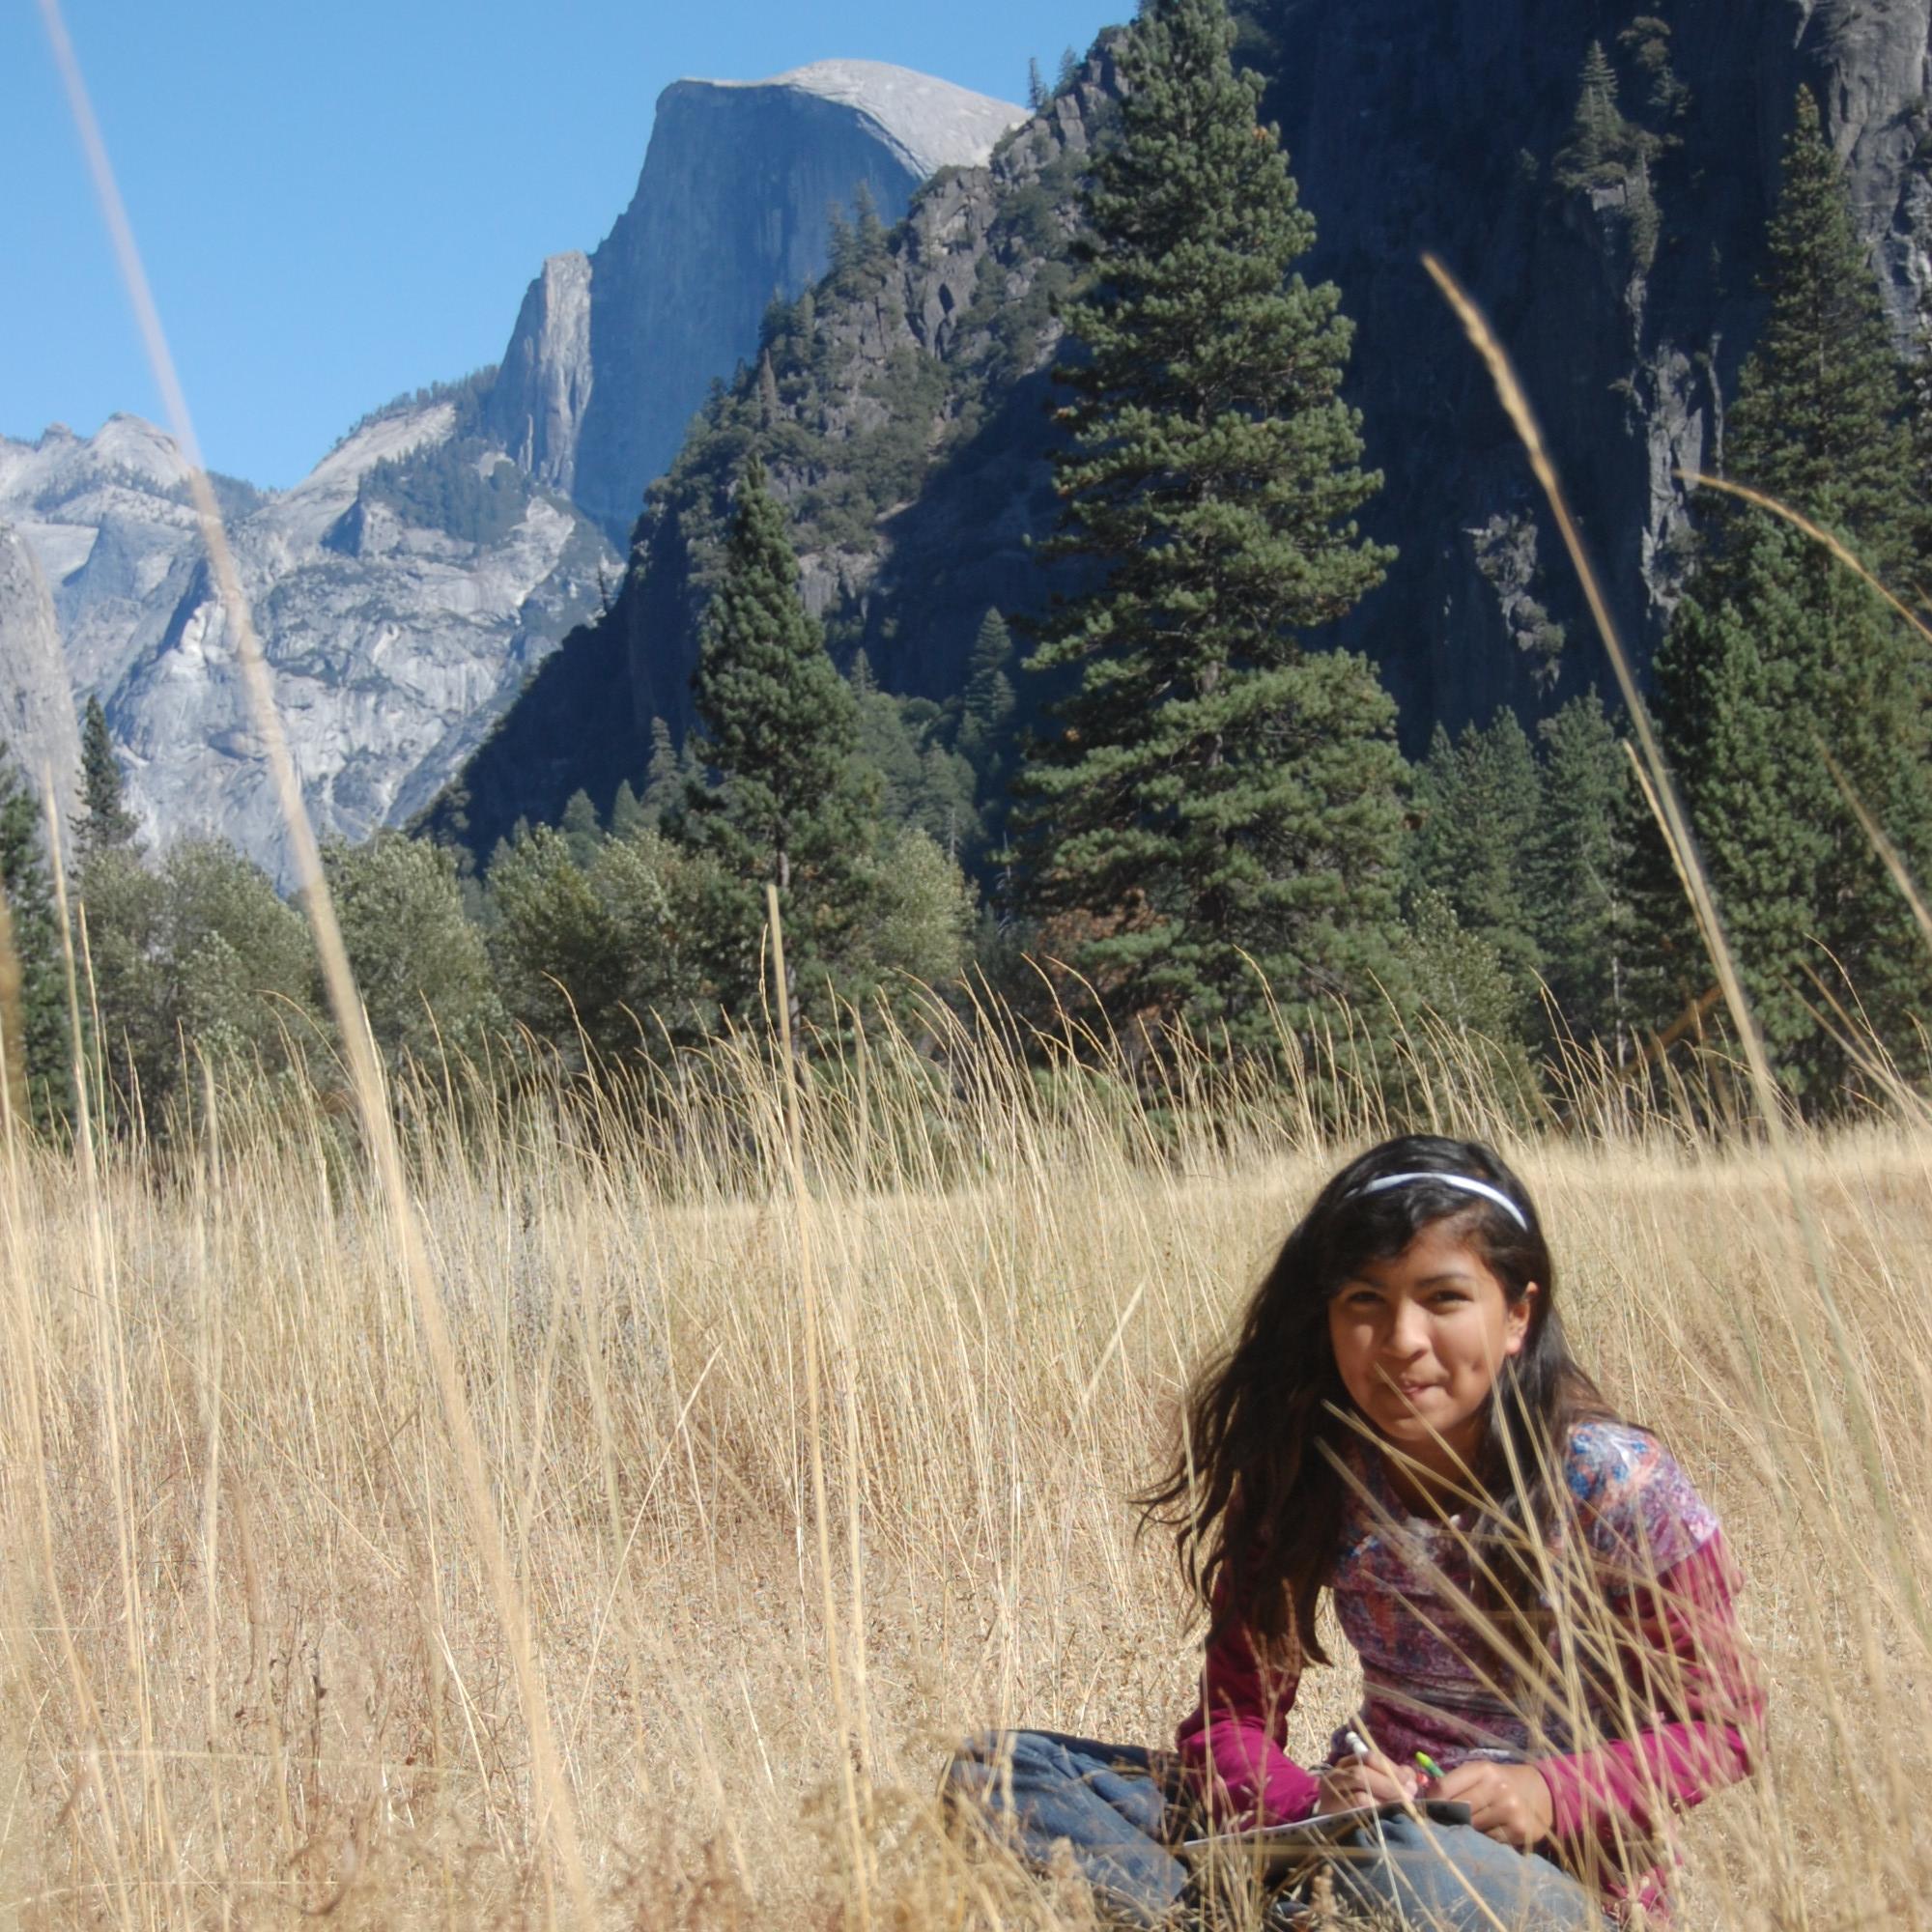 WOLF School California Science Camp